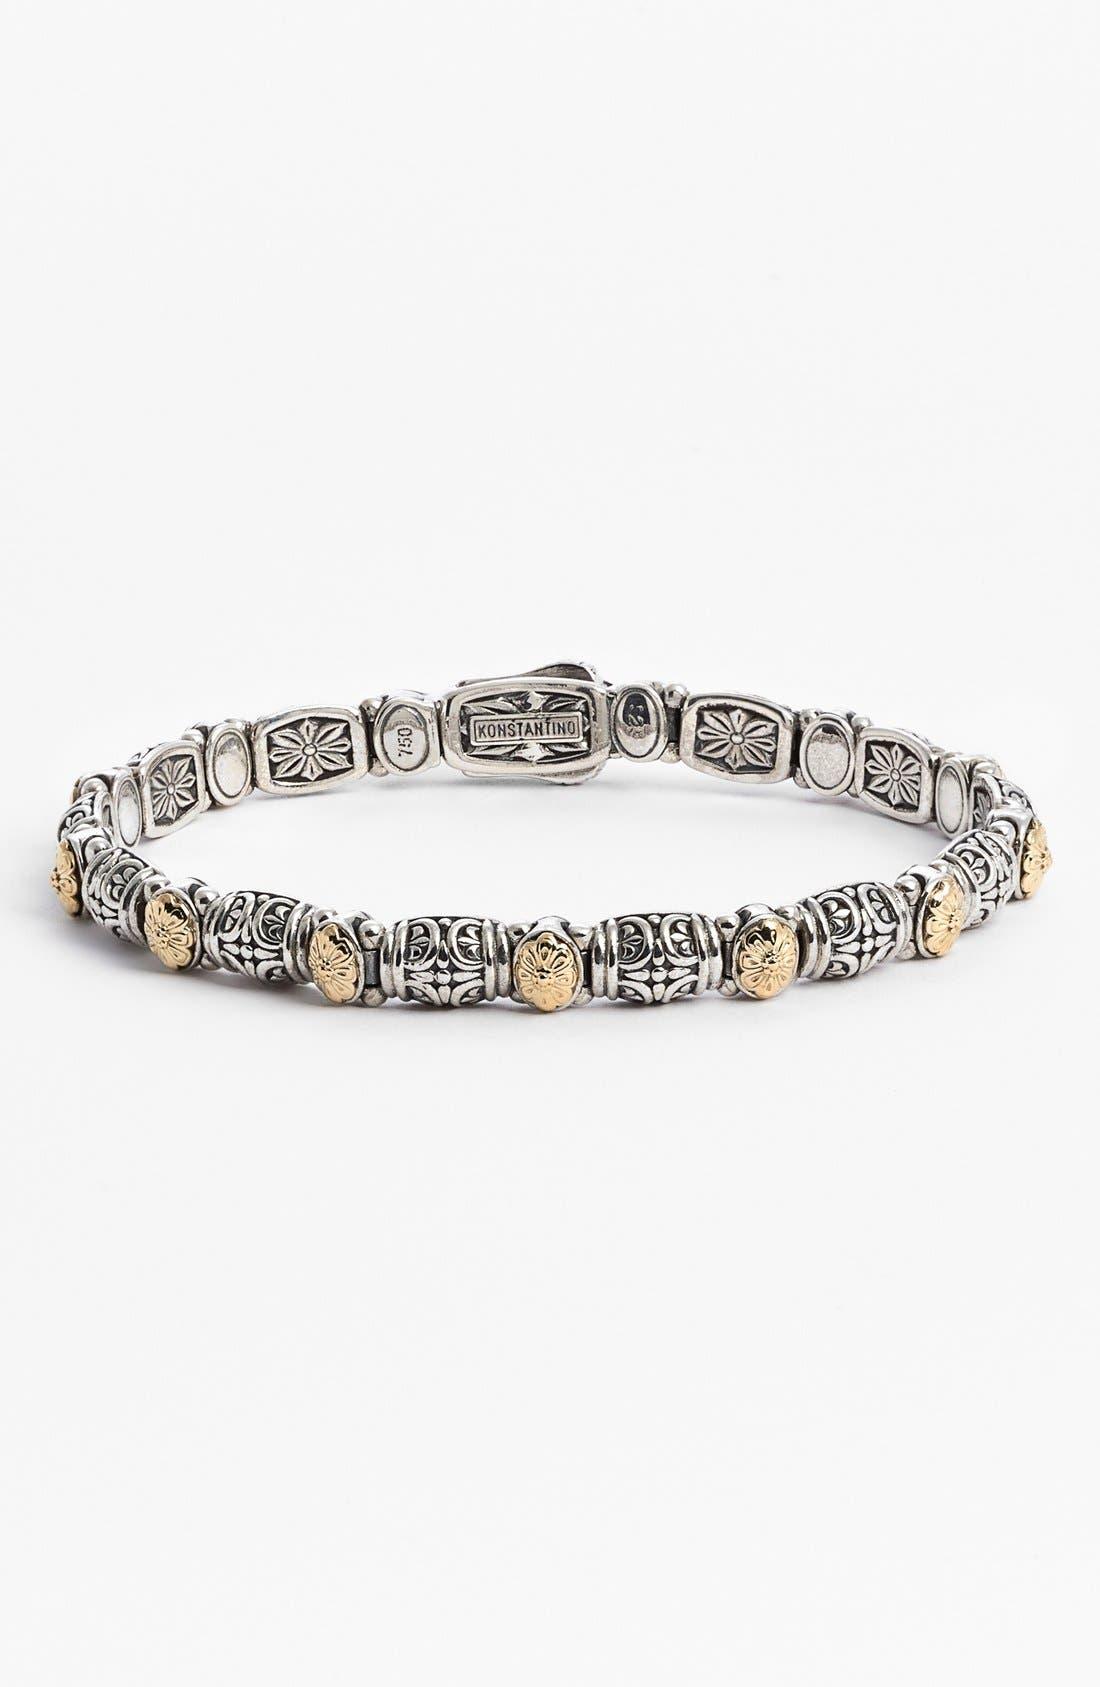 Main Image - Konstantino 'Hermione' Line Bracelet